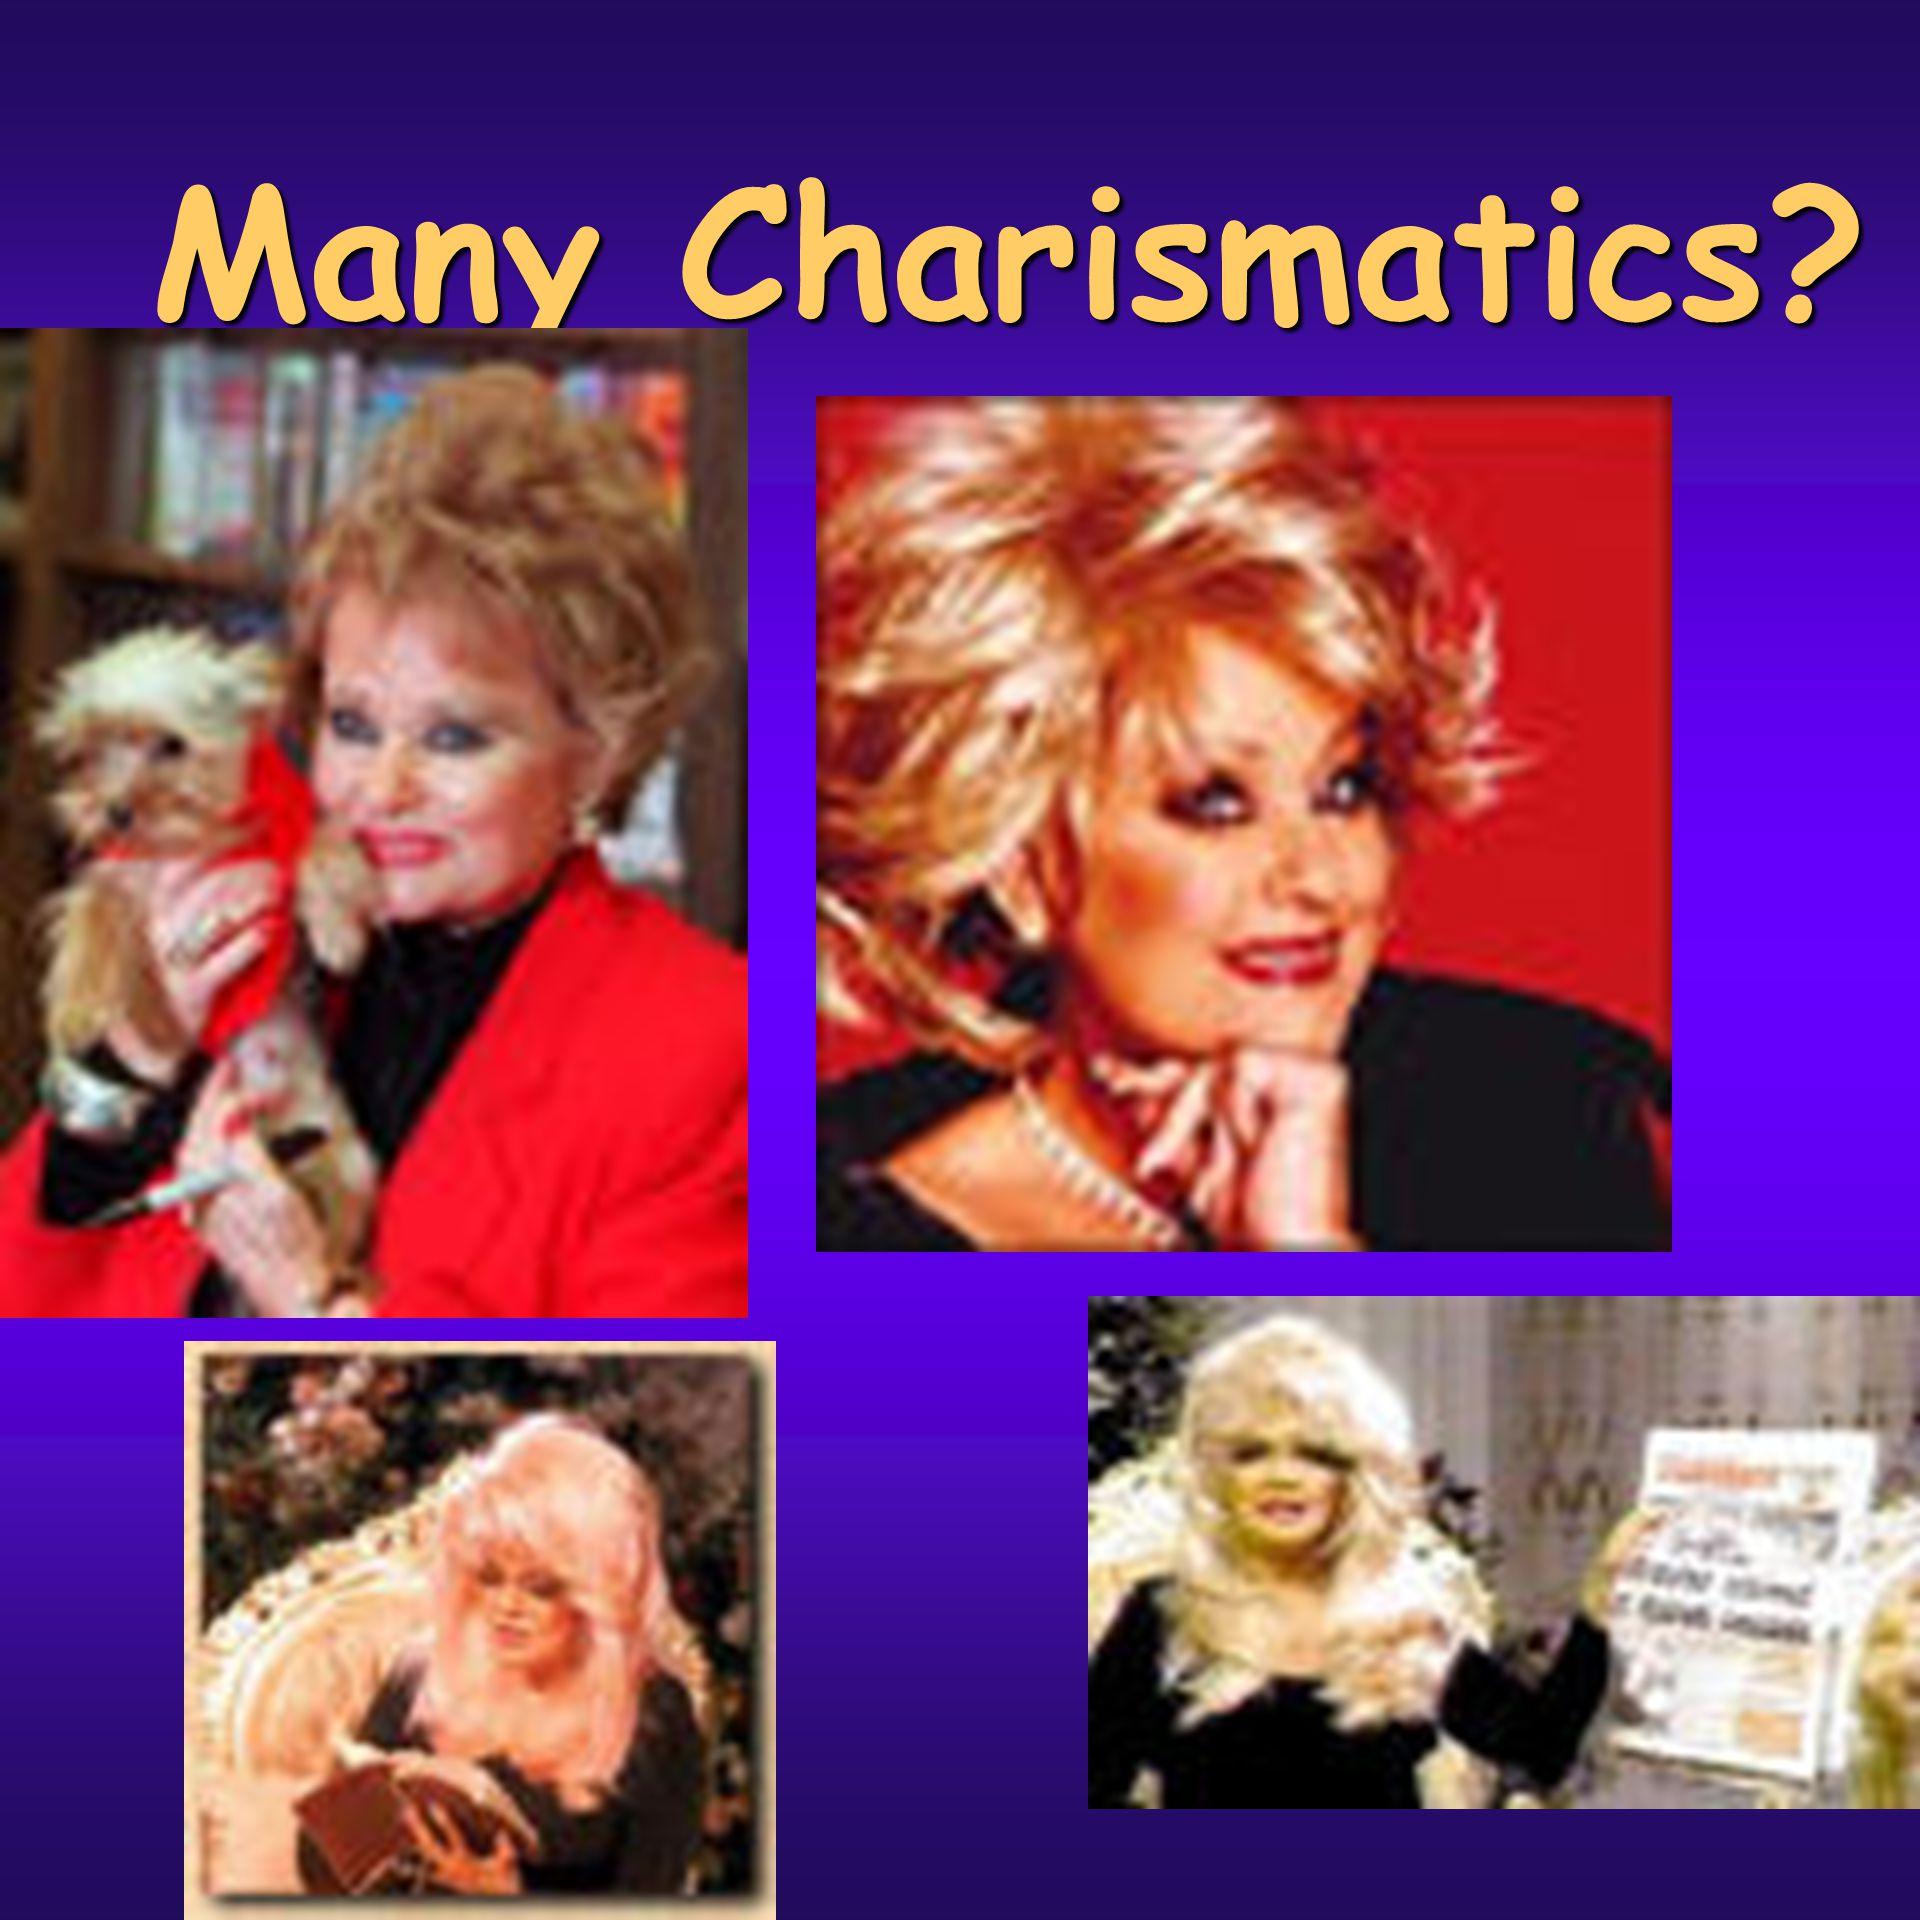 Many Charismatics?